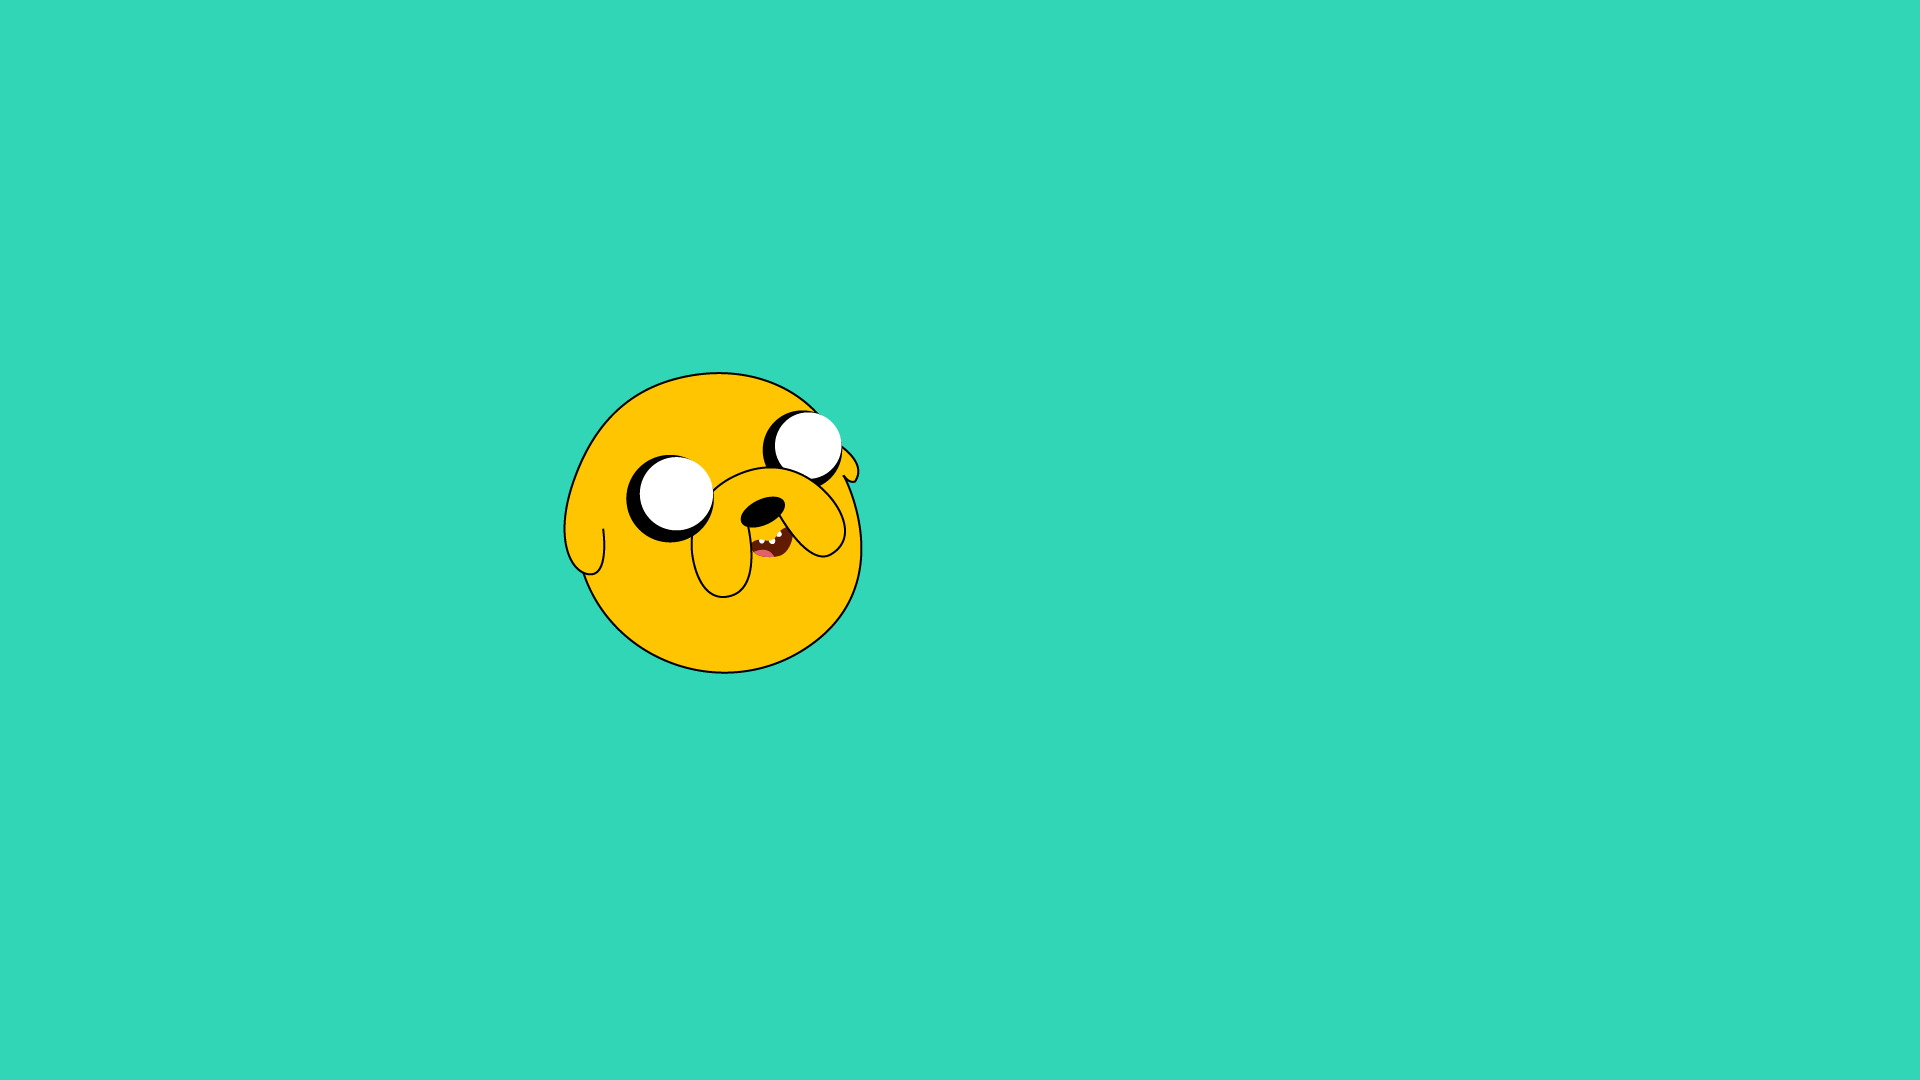 Adventure Time [Jake] wallpaper 1920x1080